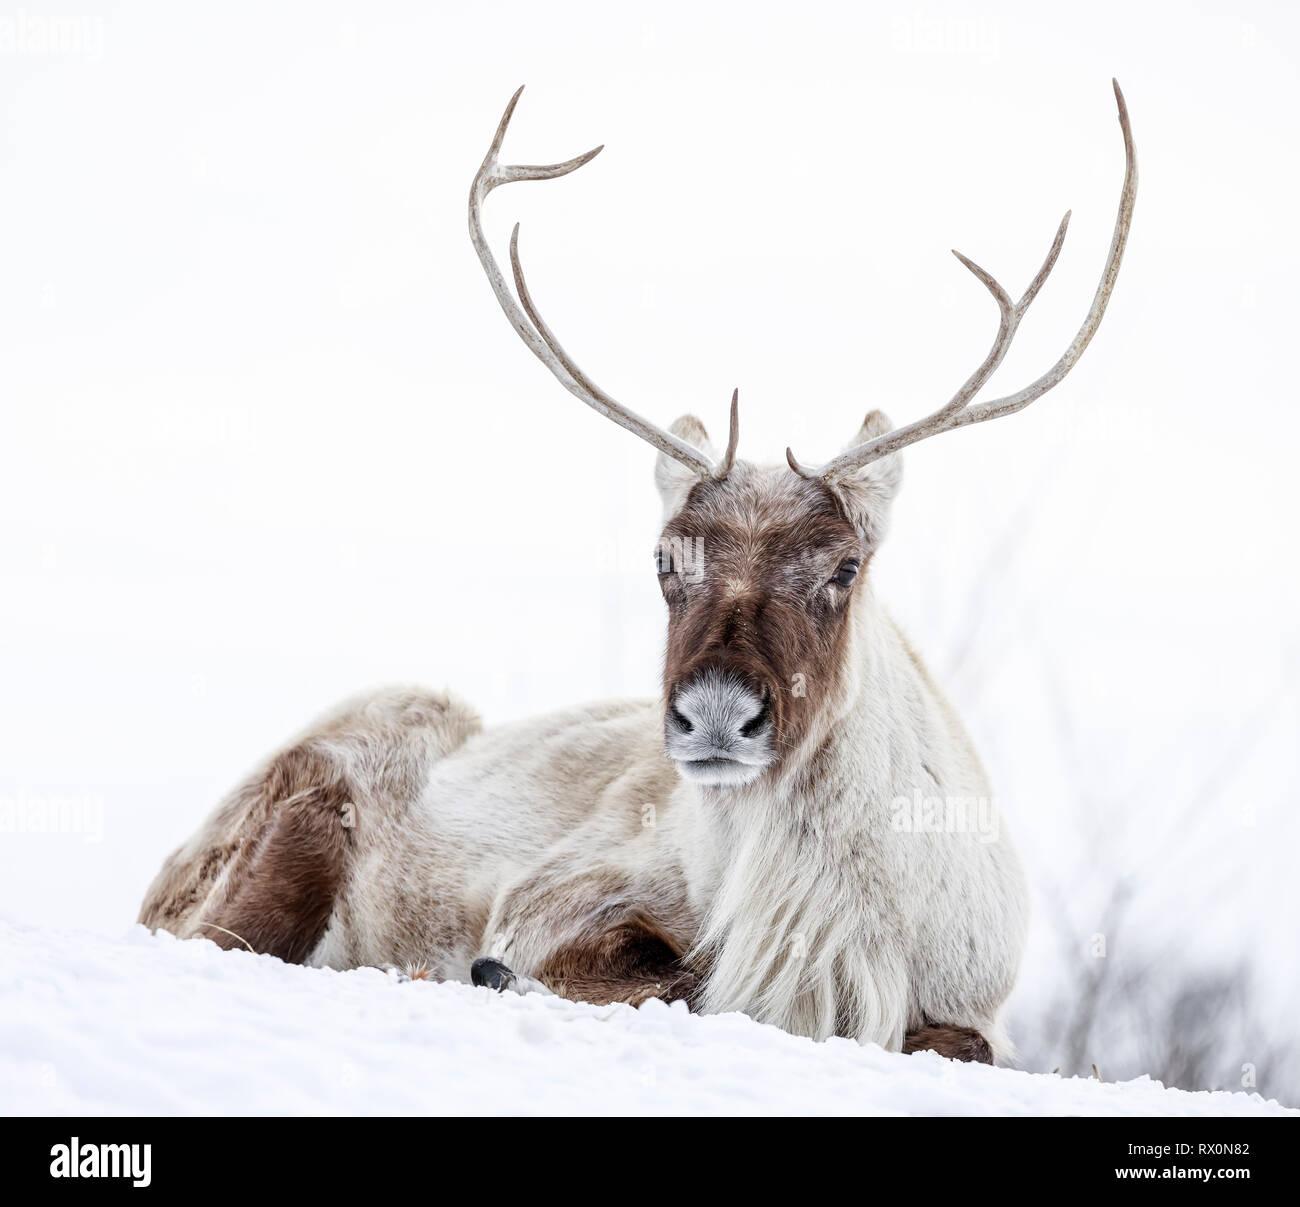 Boreal Woodland Caribou, Rangifer tarandus, in winter, captive animal, Manitoba, Canada. - Stock Image